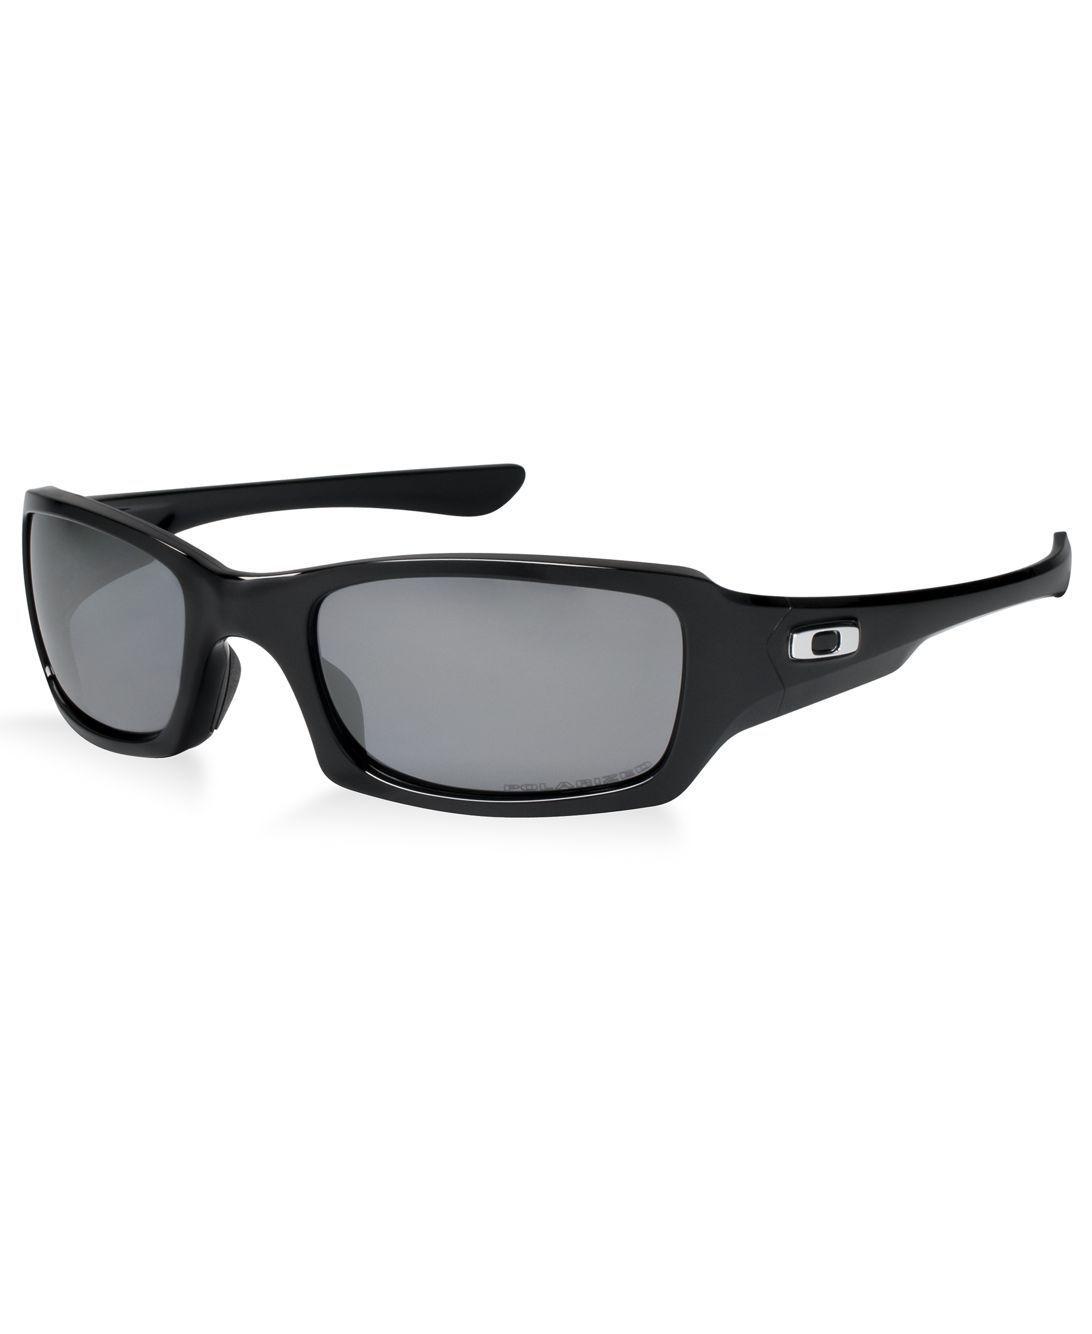 2530110f49 raybanonline on | Shades | Oakley sunglasses, Oakley, Sunglasses